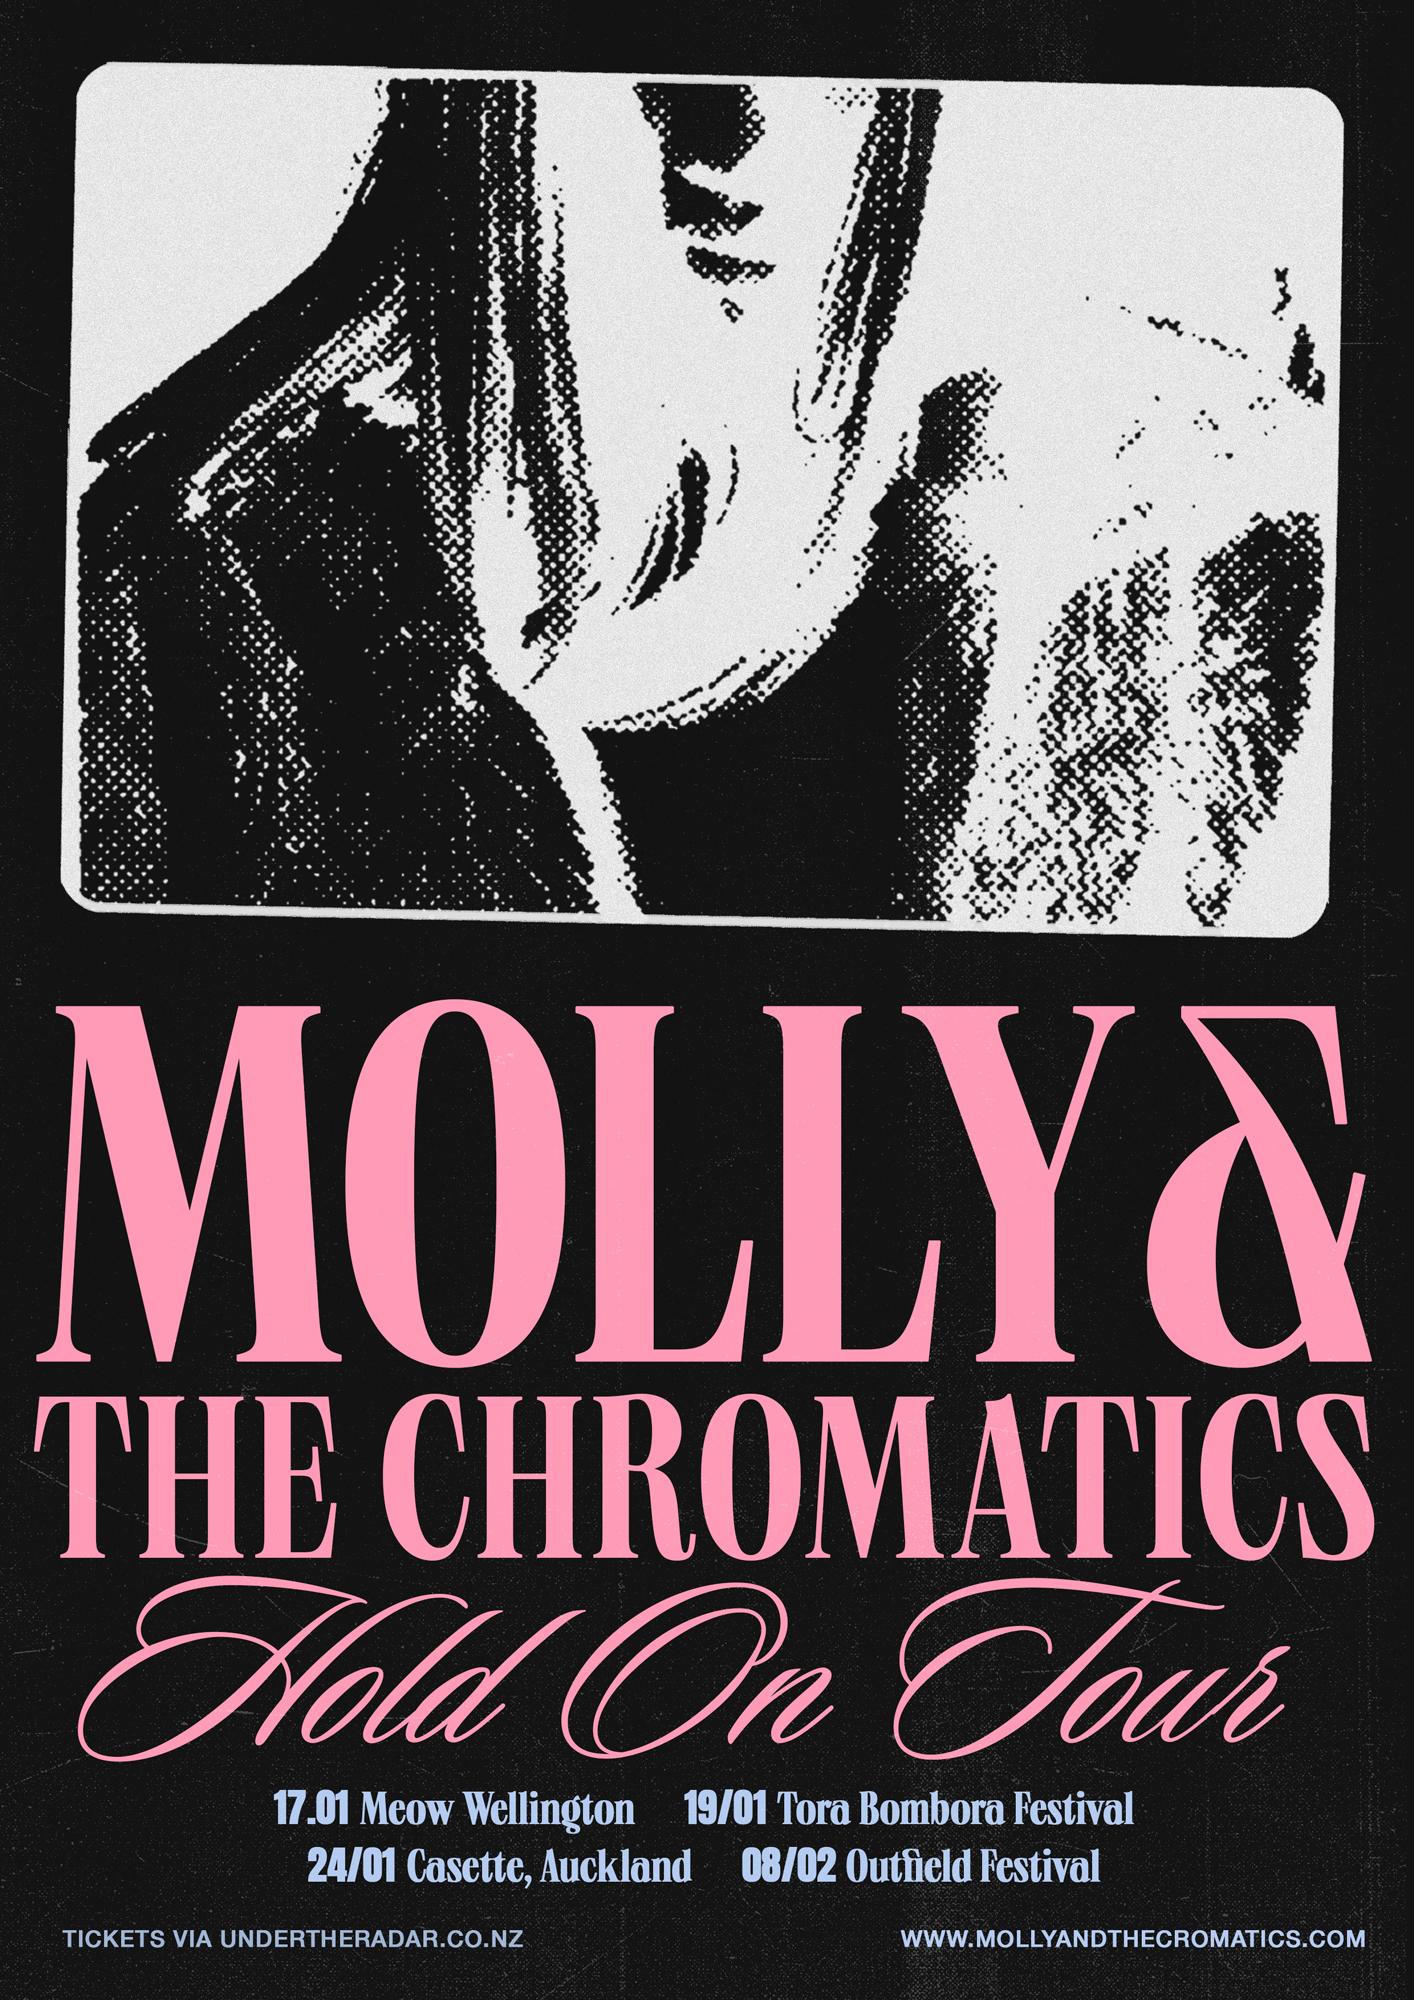 SC_Molly_Poster_C01